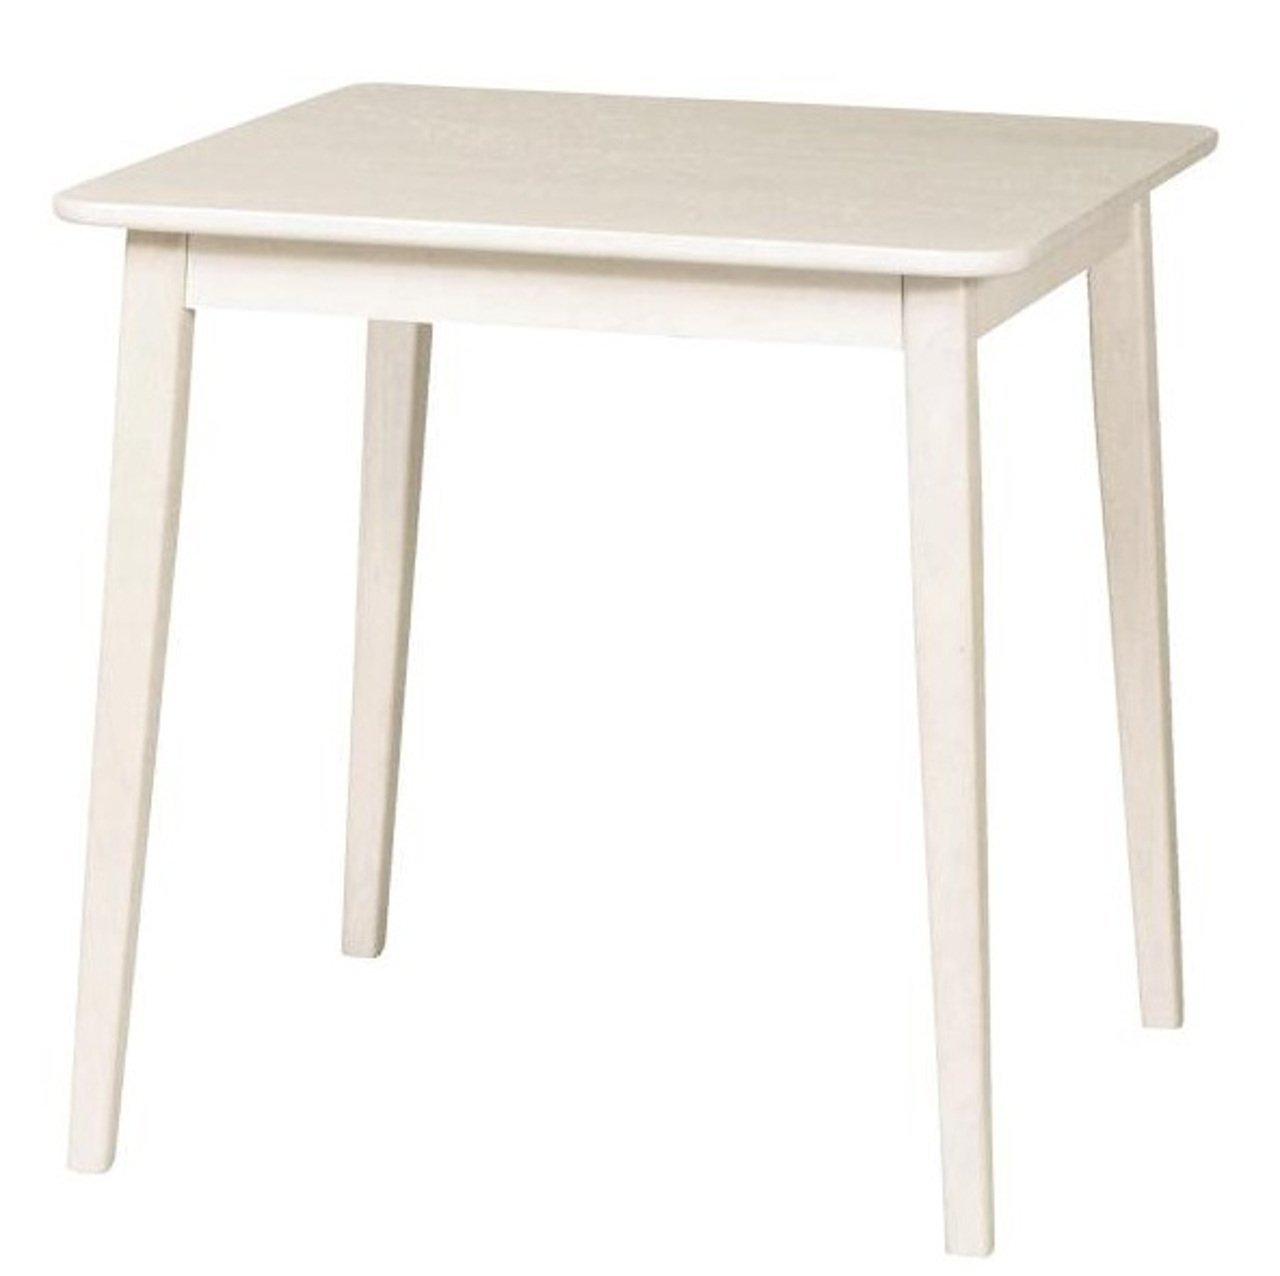 SINAPP ダイニングテーブル アンティーク調シリーズ 2人用 コンパクト センターテーブル SIK0586 ホワイト B07BFLM1CW